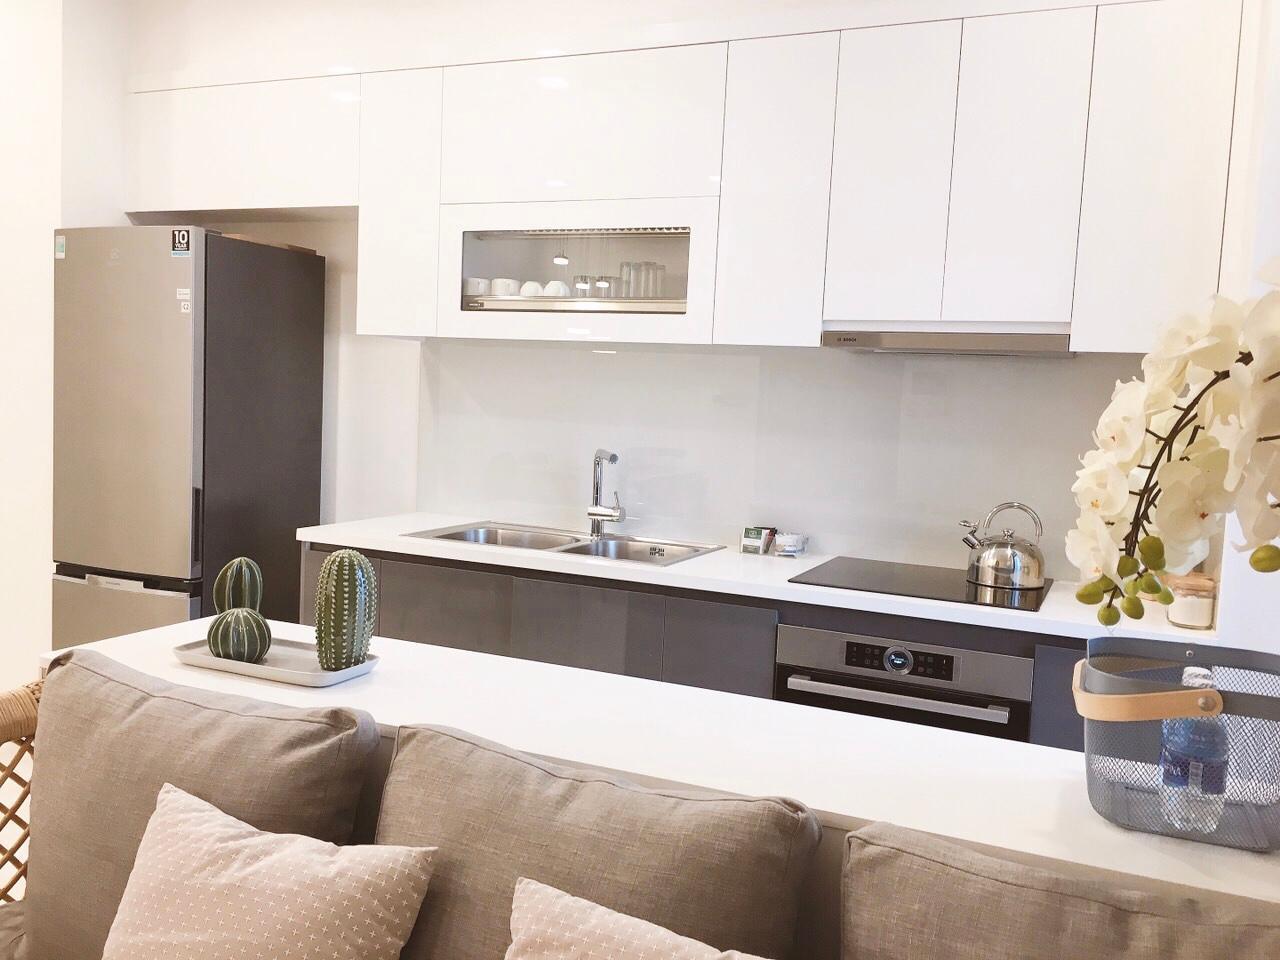 LiEBESAIGON Luxury Apartment In The City Center